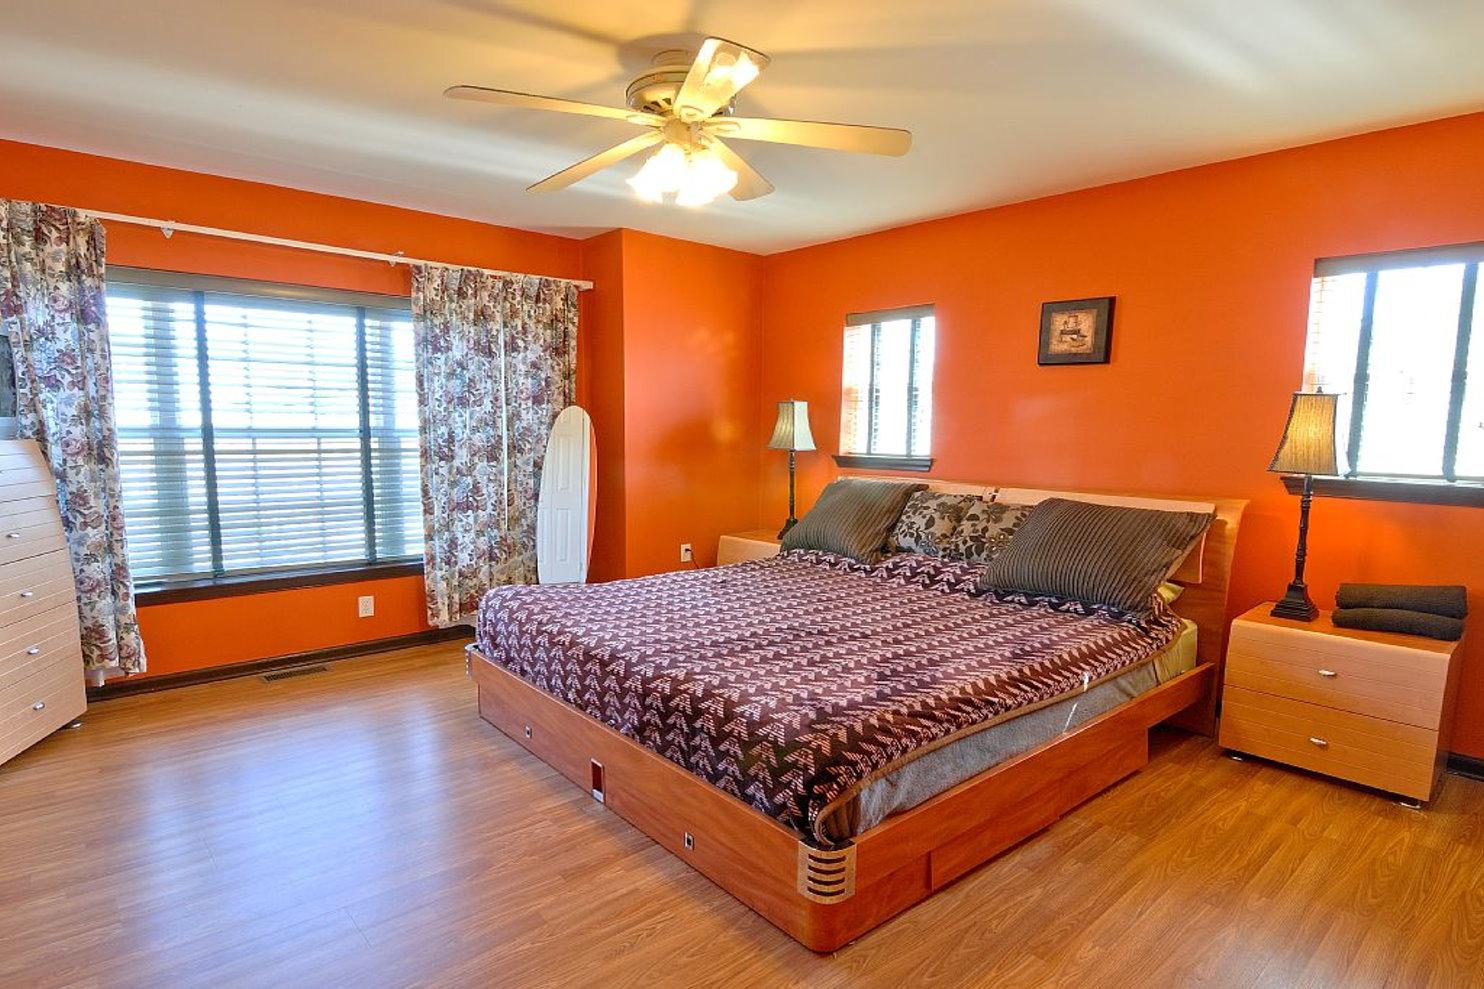 Beach House Rentals In Atlantic City Nj Part - 40: Atlantic City, NJ Vacational Home